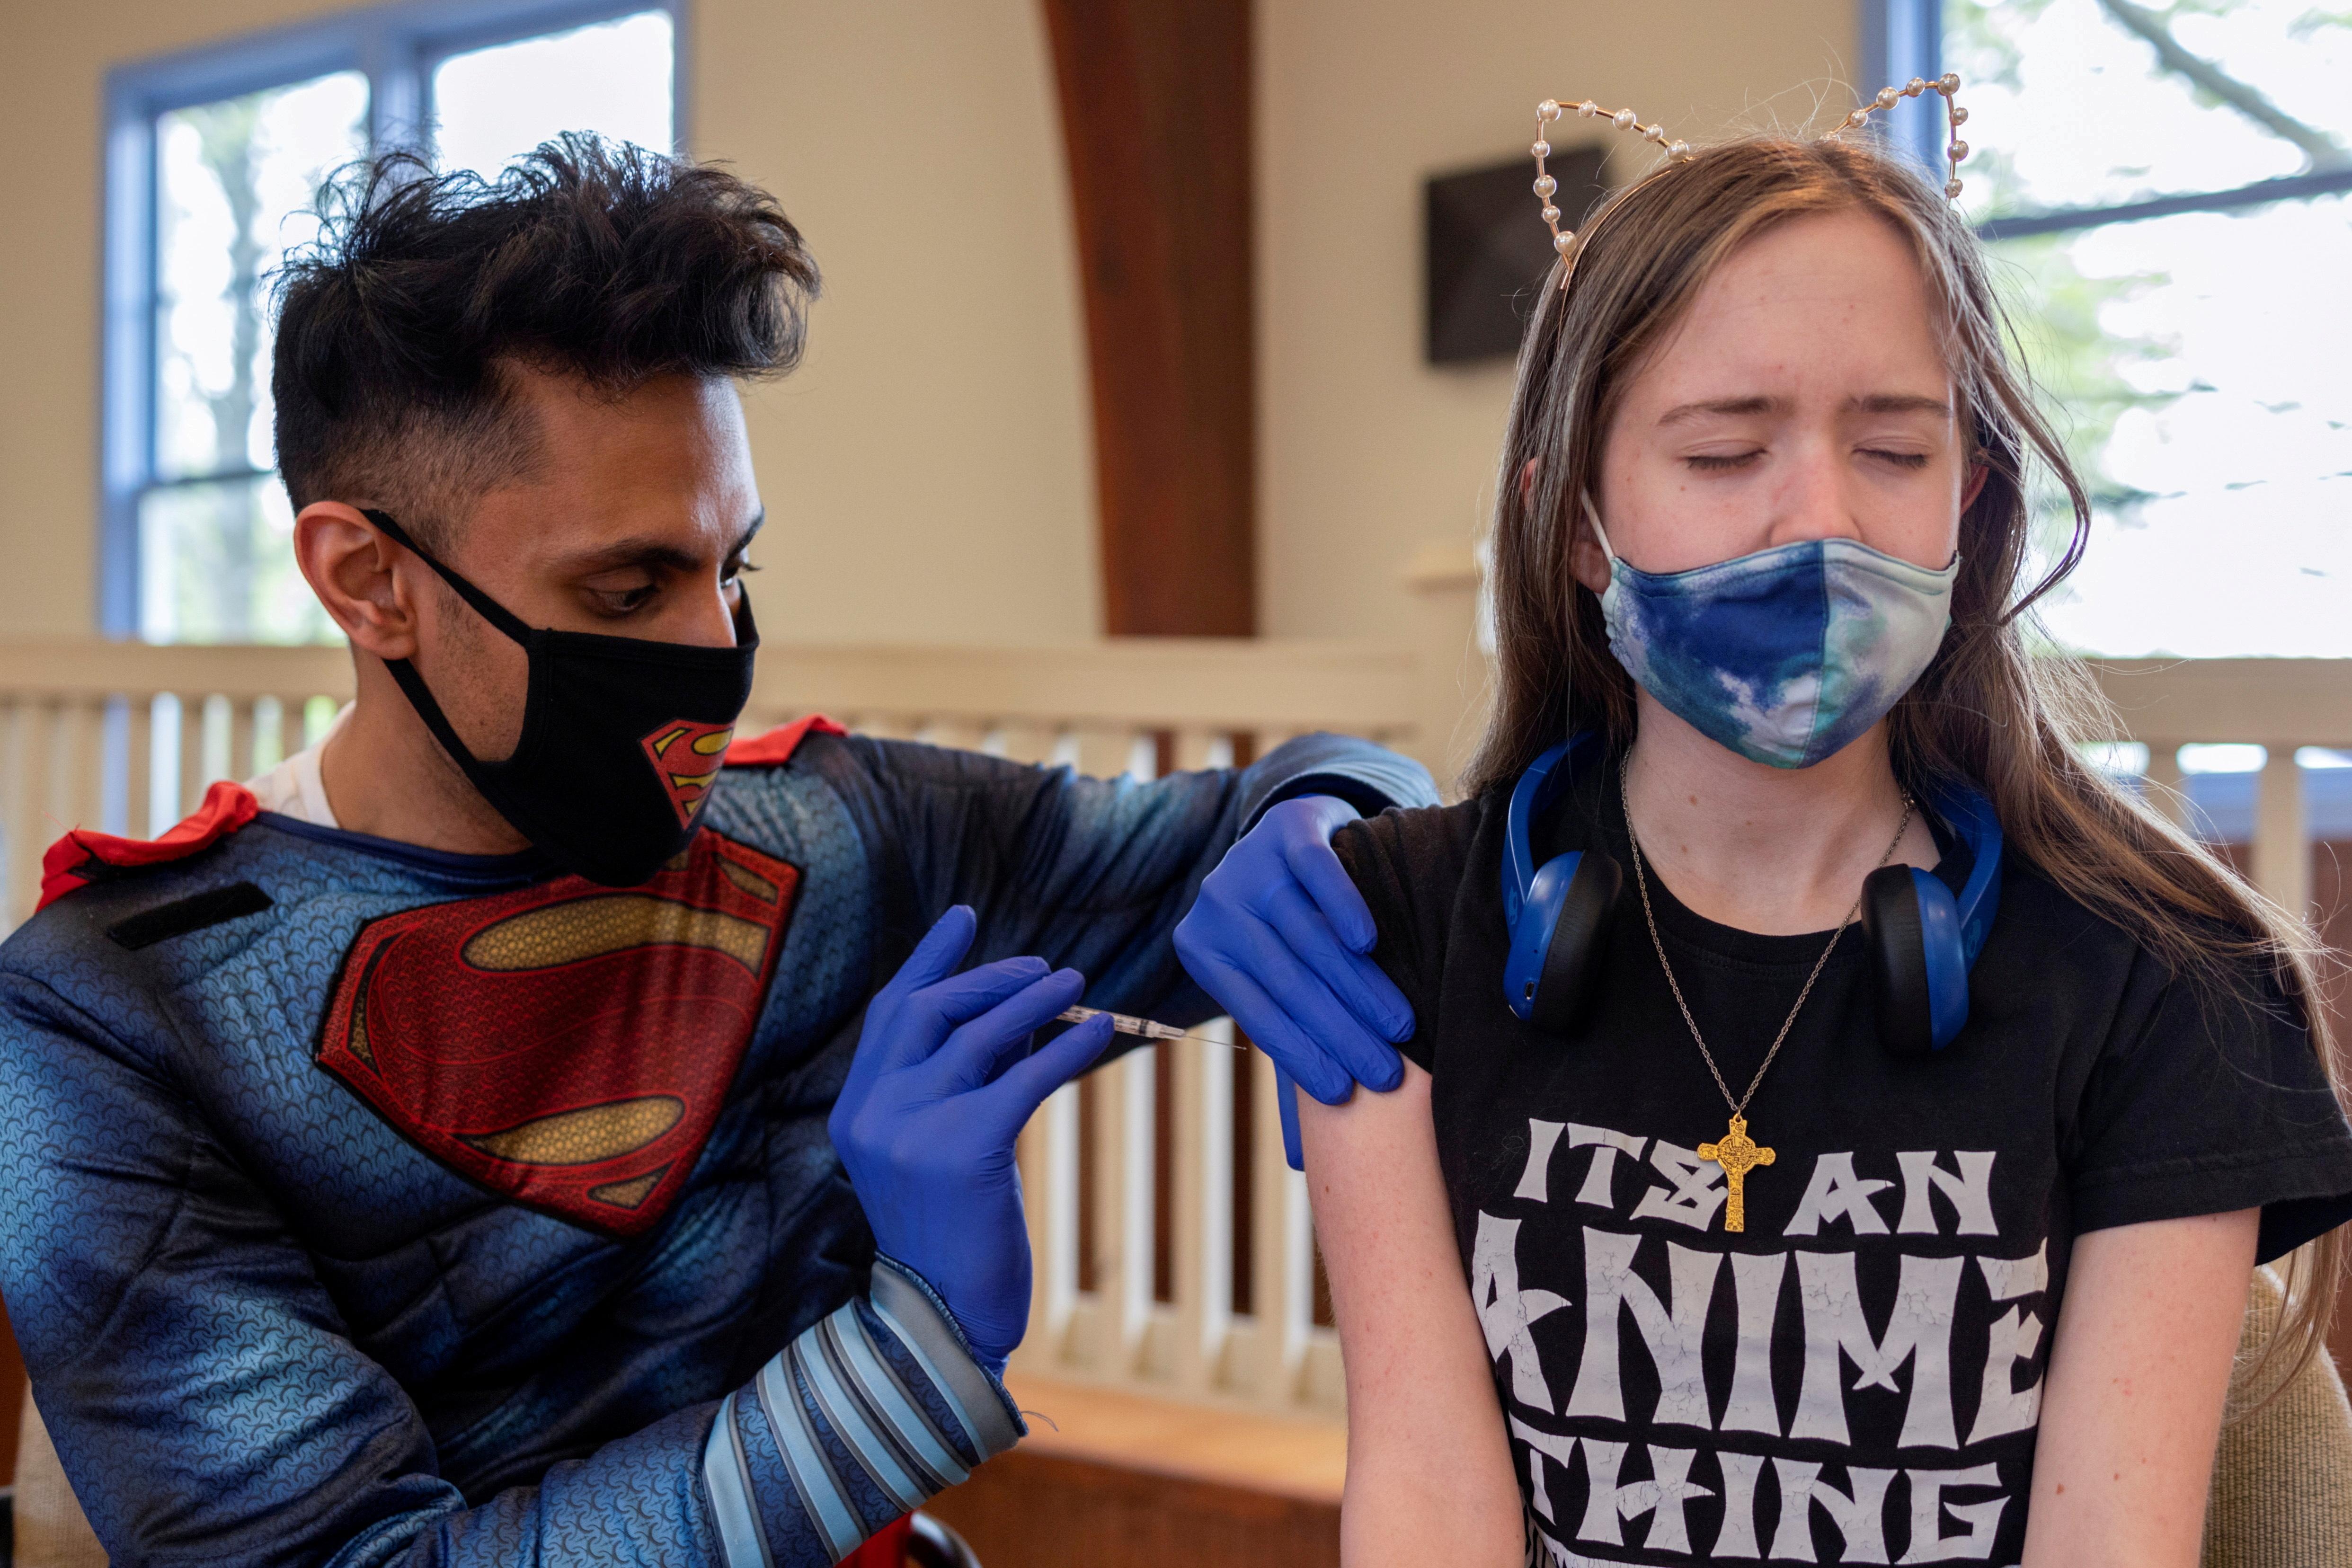 Kira Lundell, 16, receives a coronavirus disease (COVID-19) vaccine in Worcester, Pennsylvania, U.S., April 29, 2021. REUTERS/Hannah Beier/File Photo